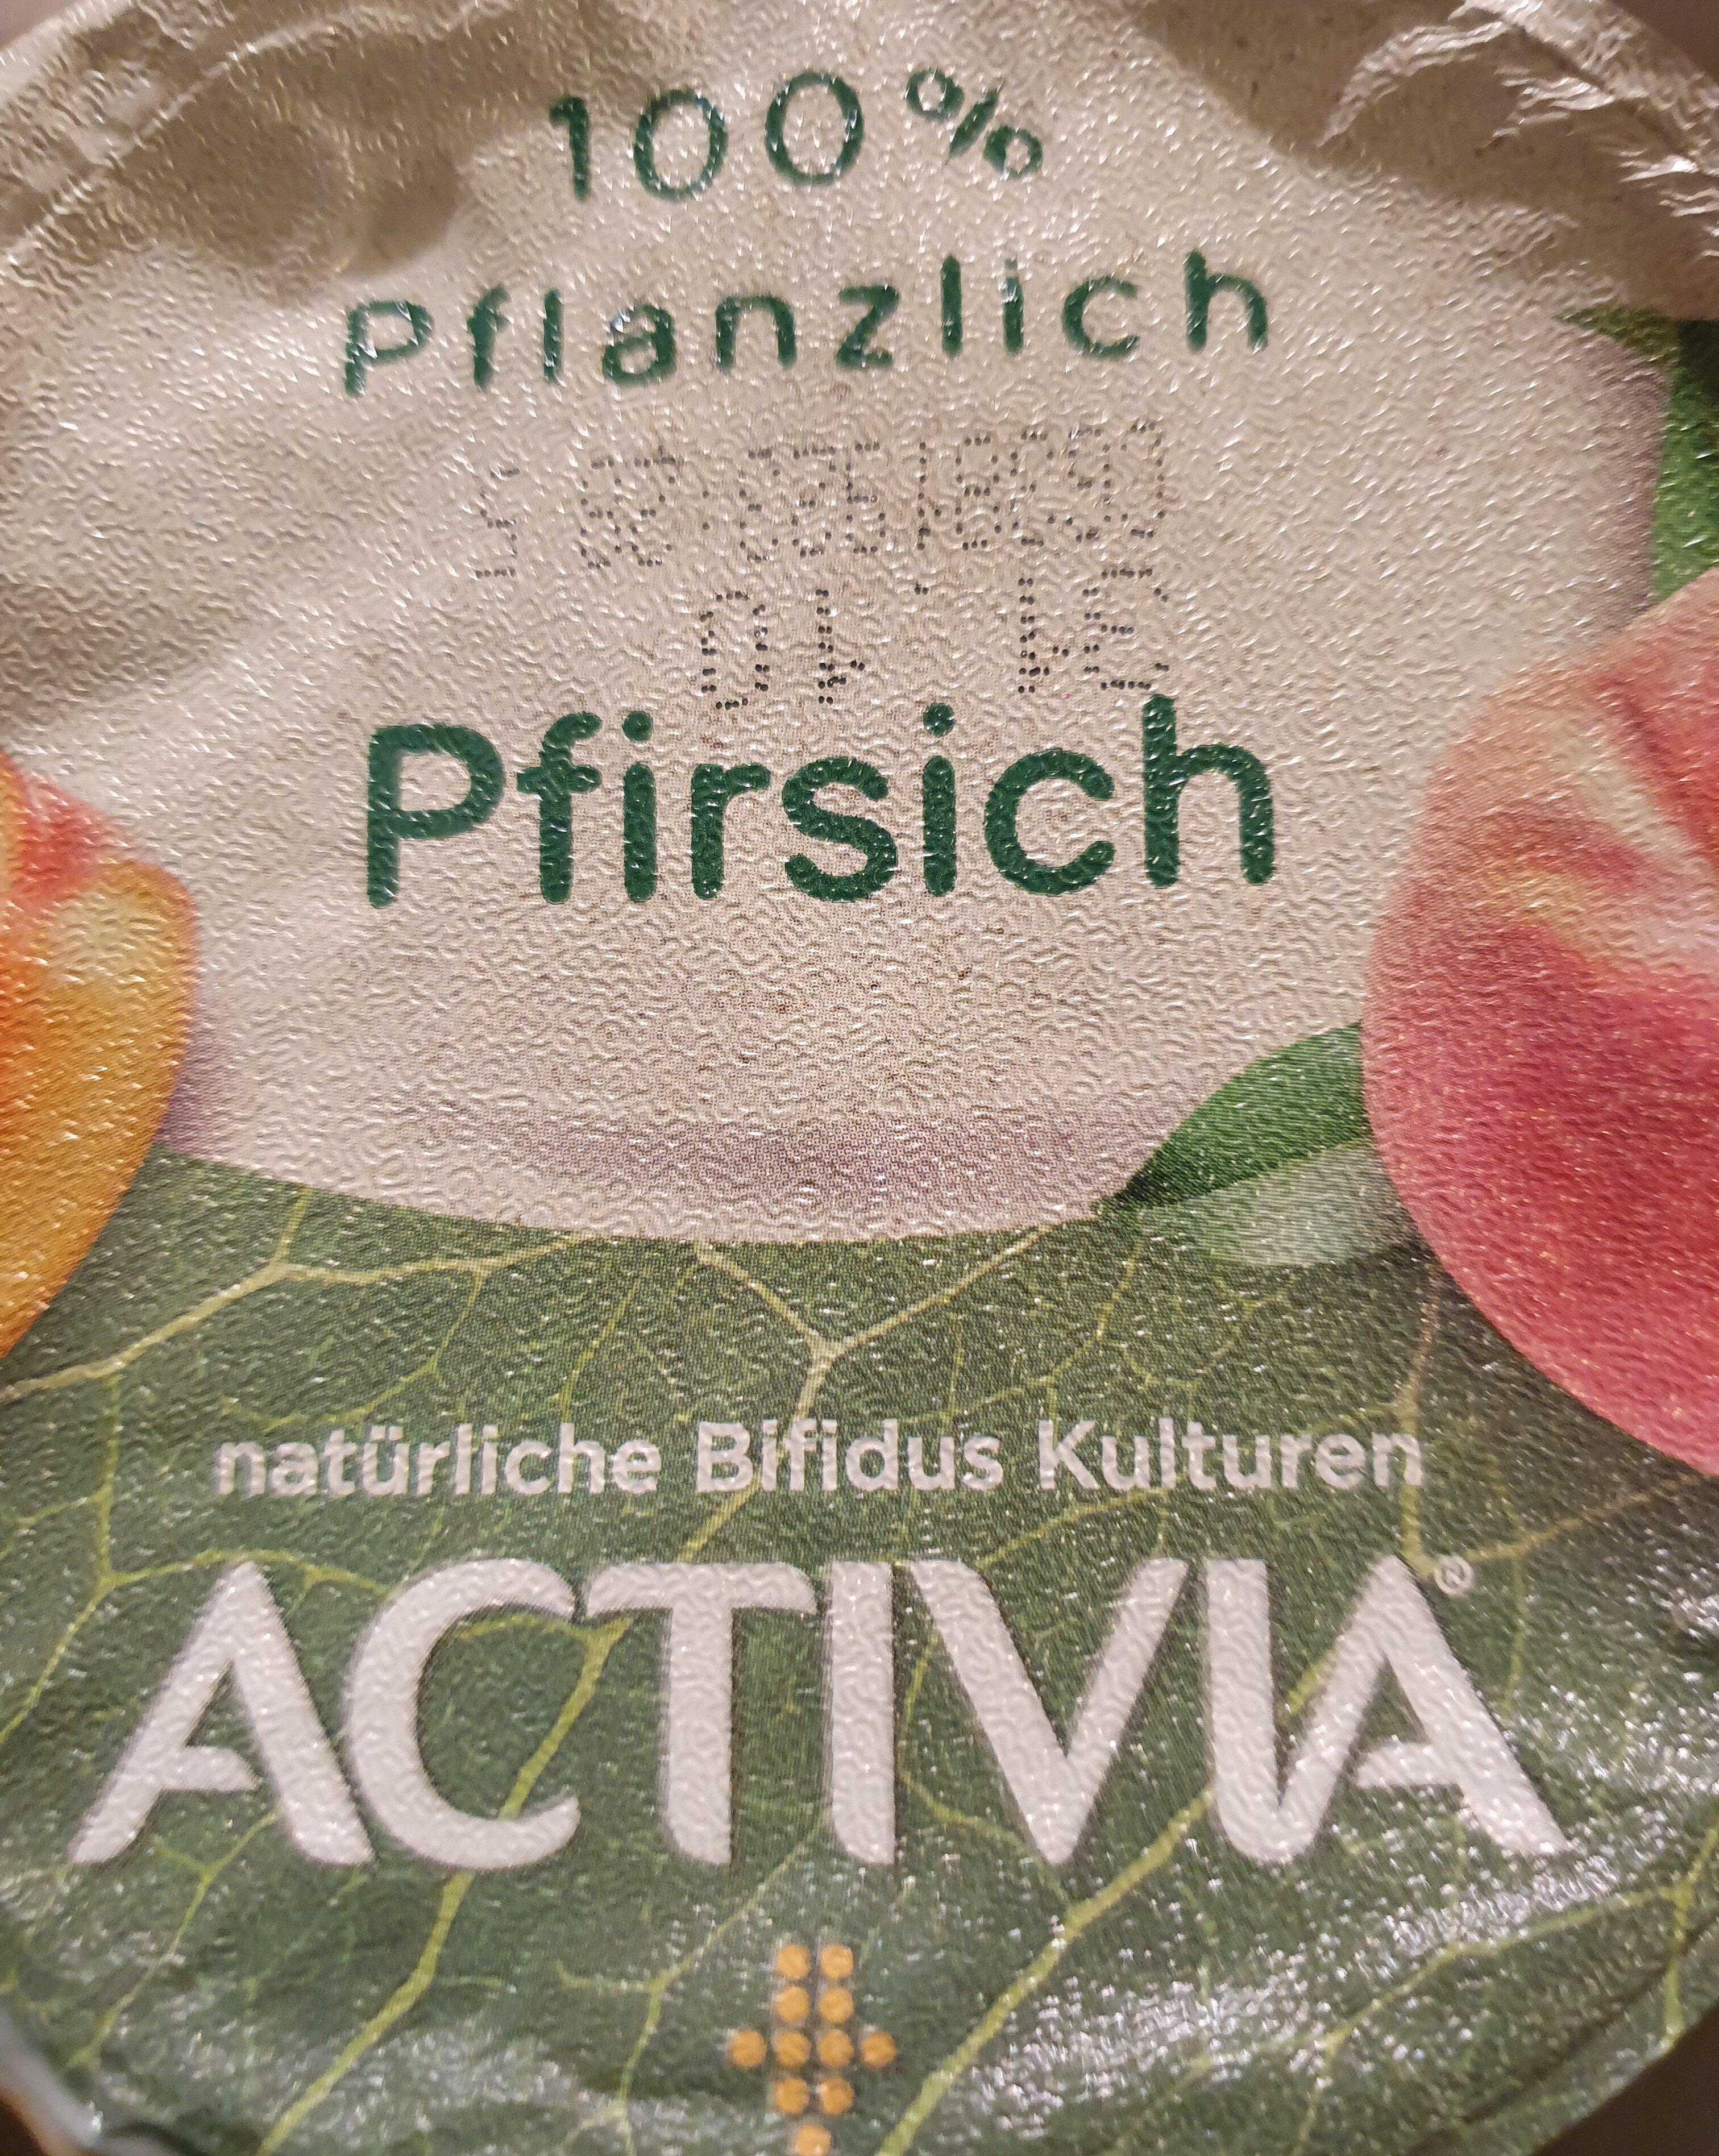 Activia 100% pflanzlich pfirsich - Product - de